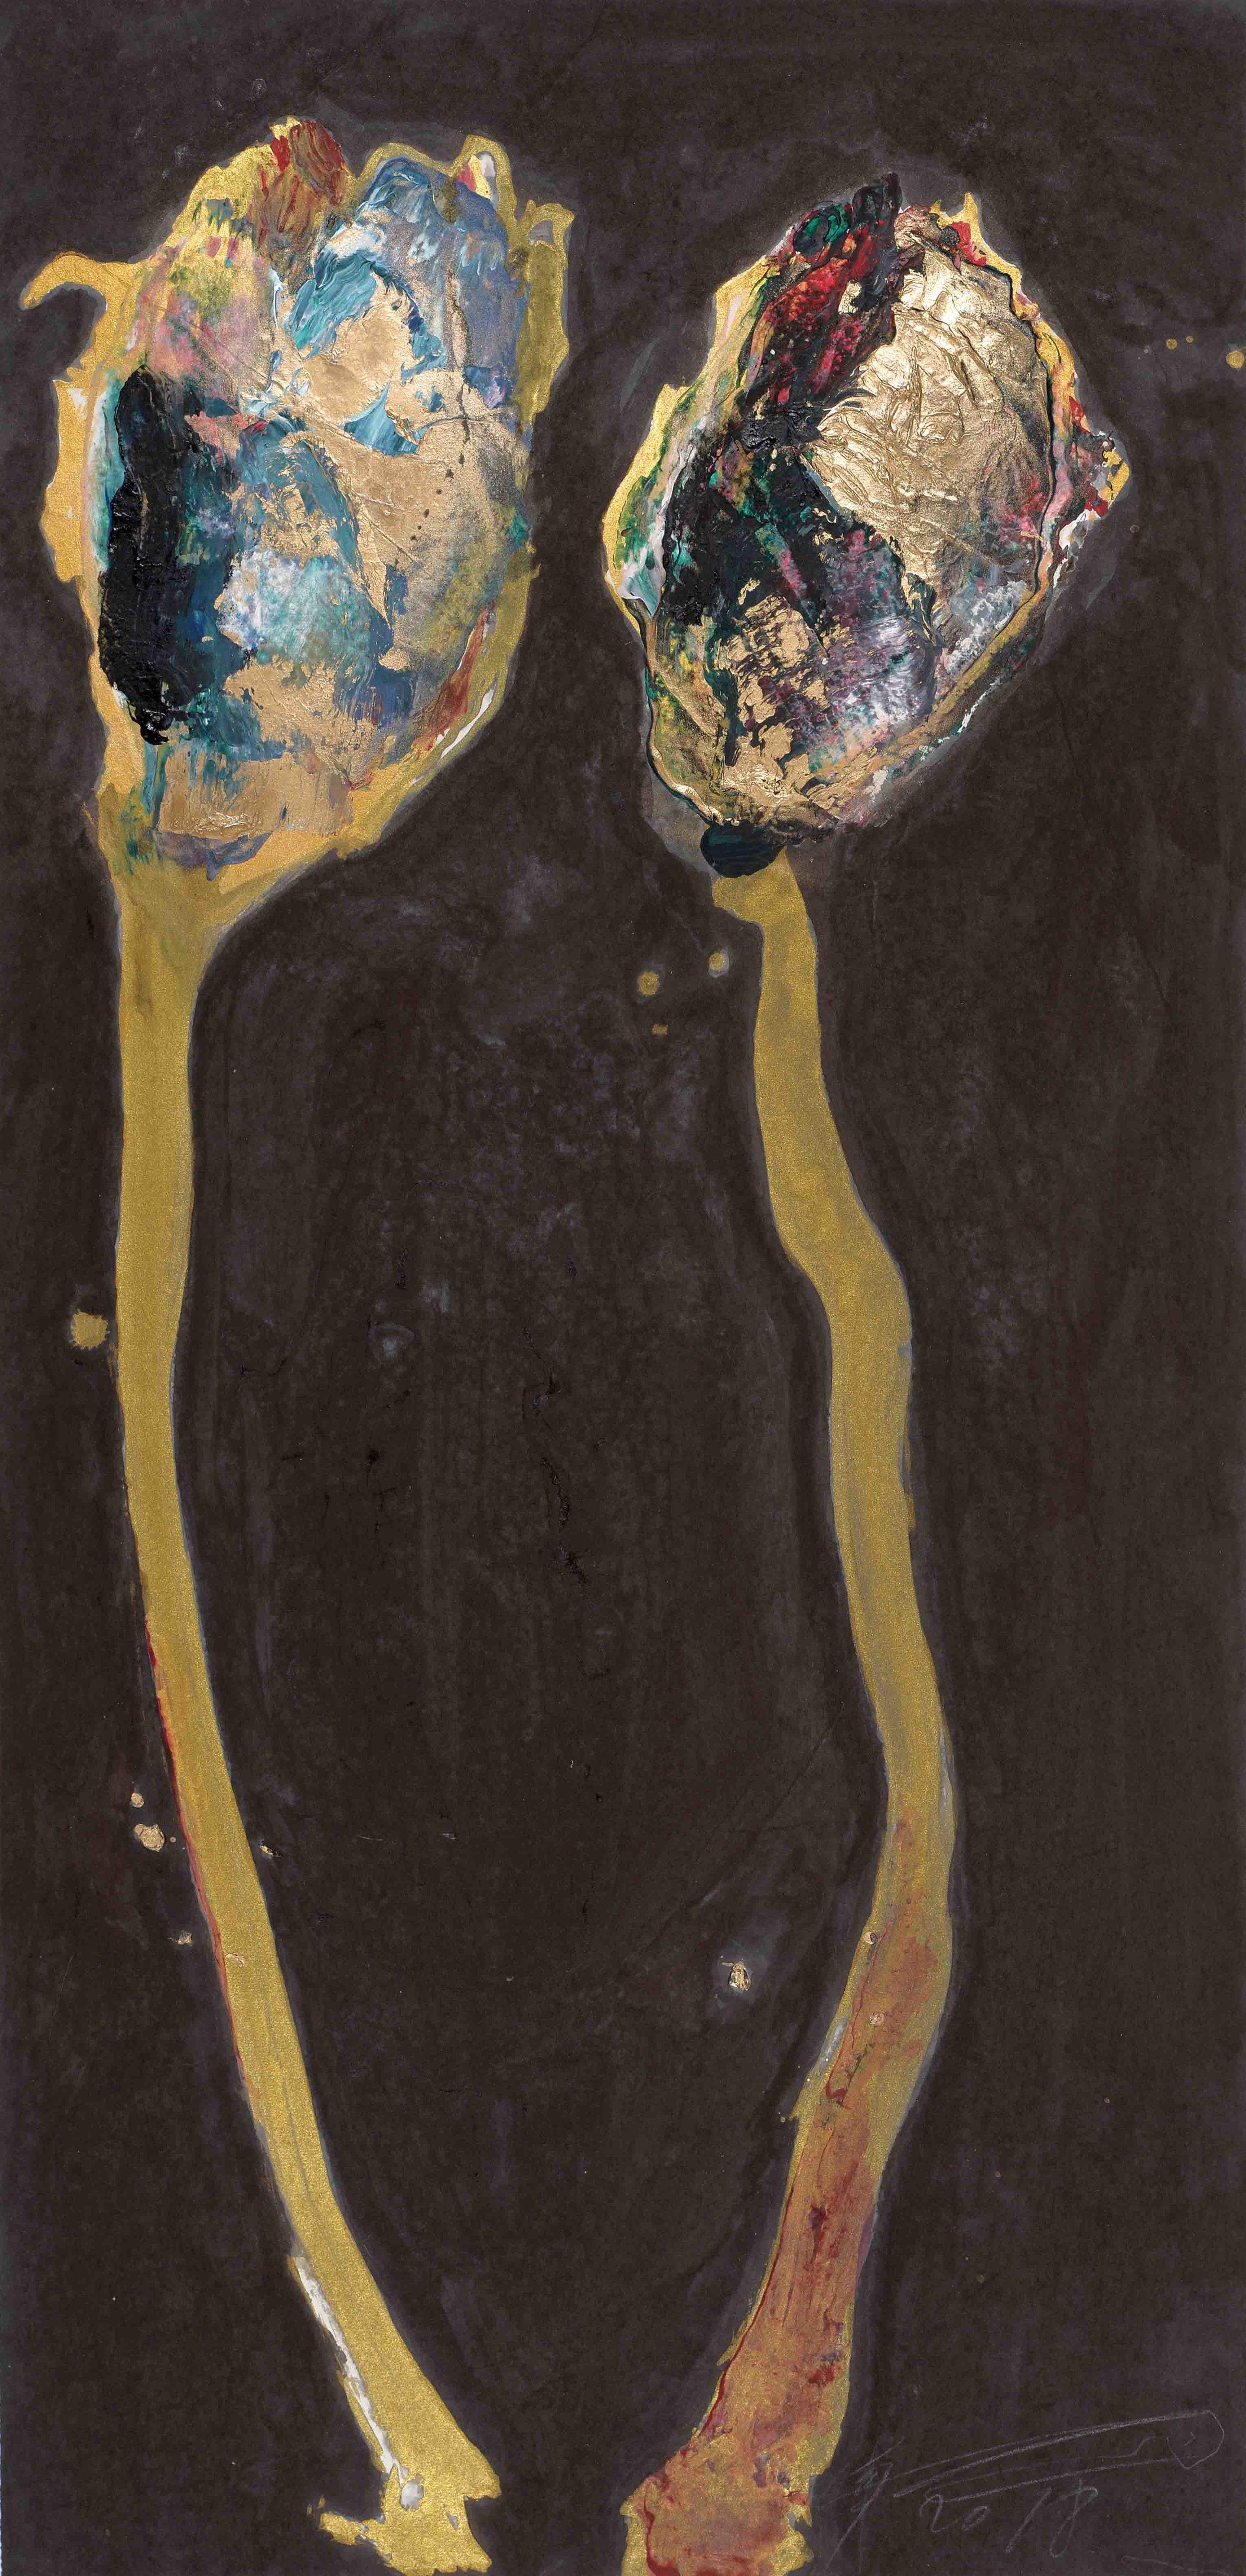 魏立剛 WEI Ligang〈雙花圖–棕 Double Flowers: Brown〉